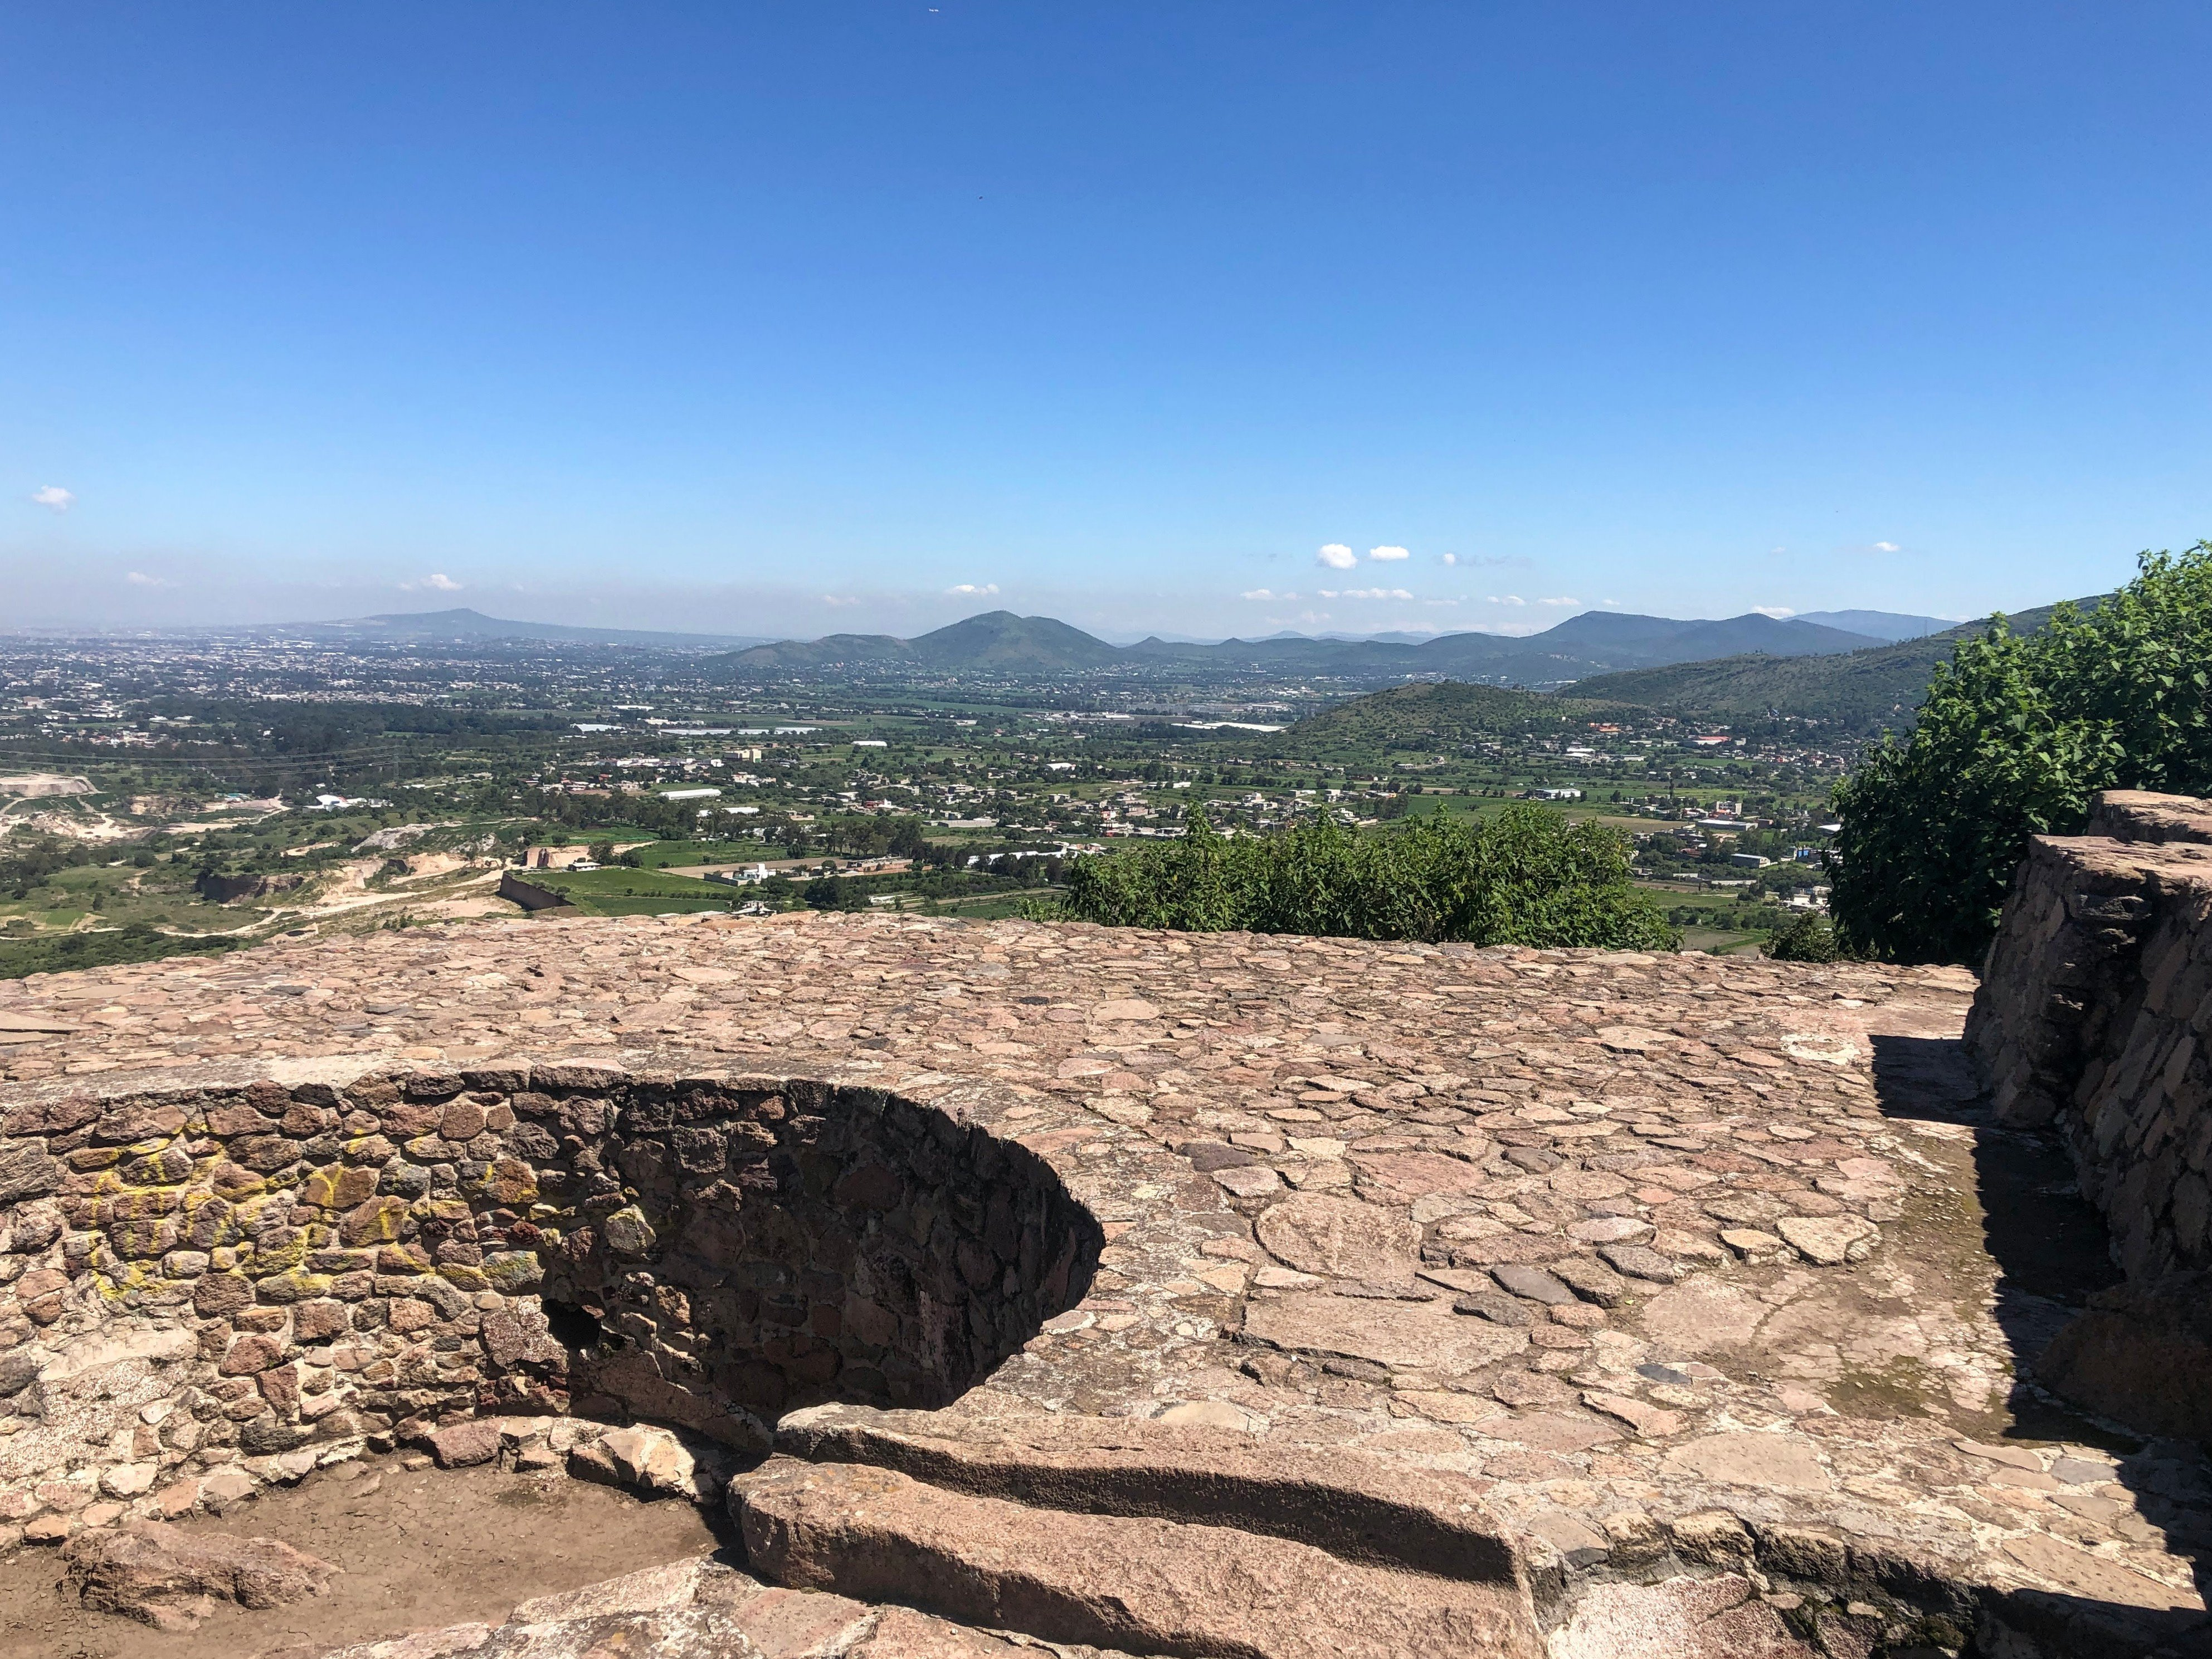 Texcotzingo ruins in texcoco